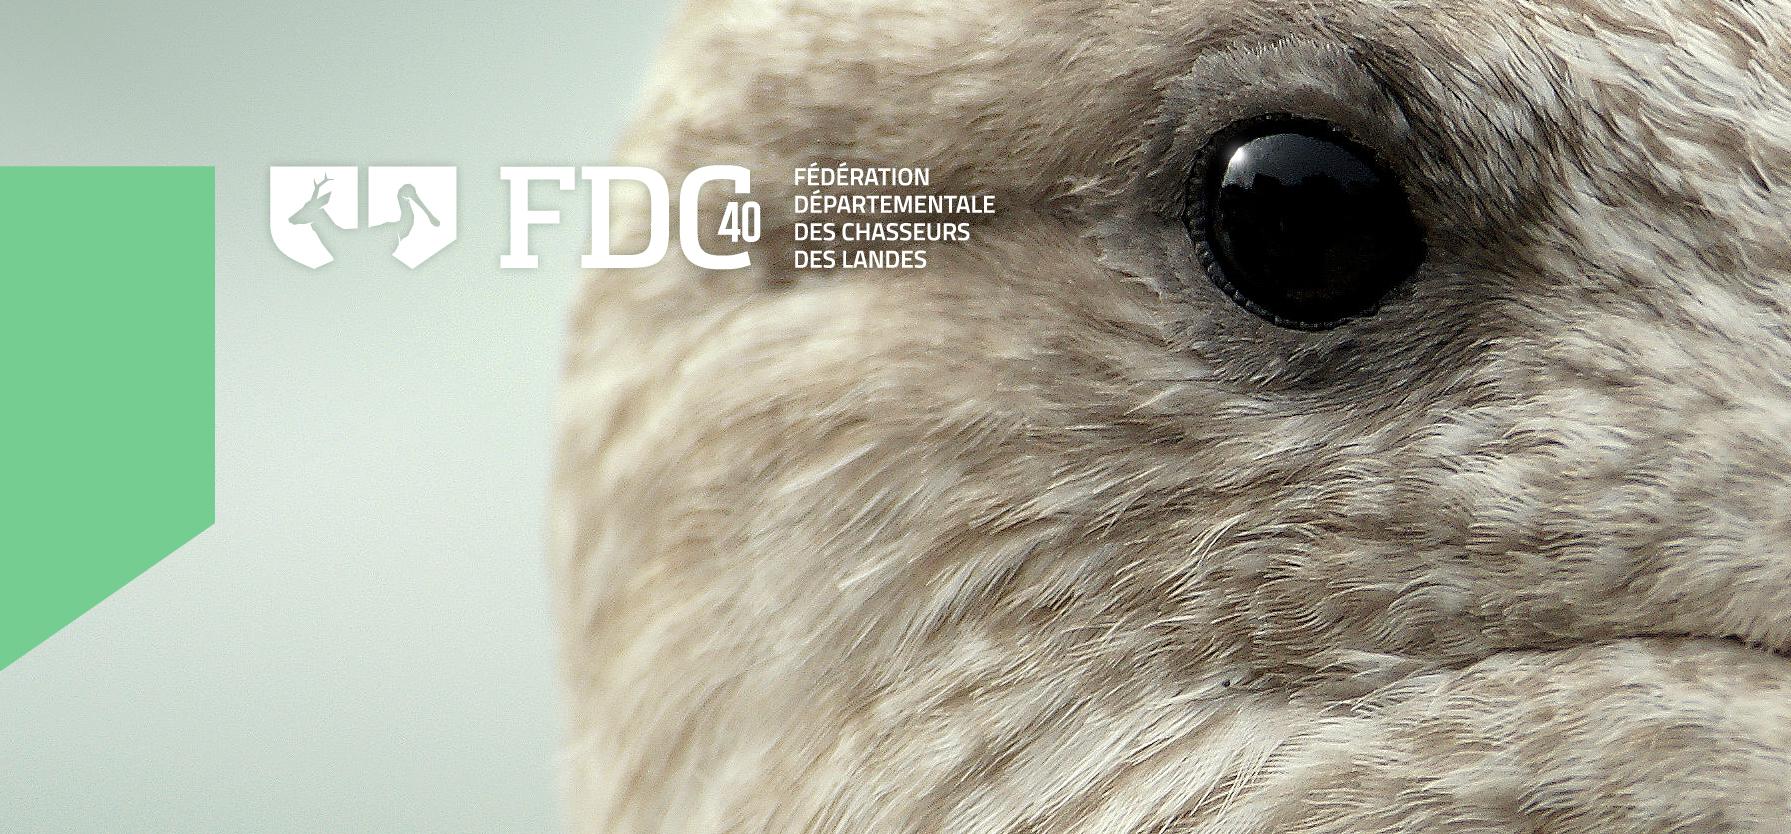 fdc40_identite_visuelle-01